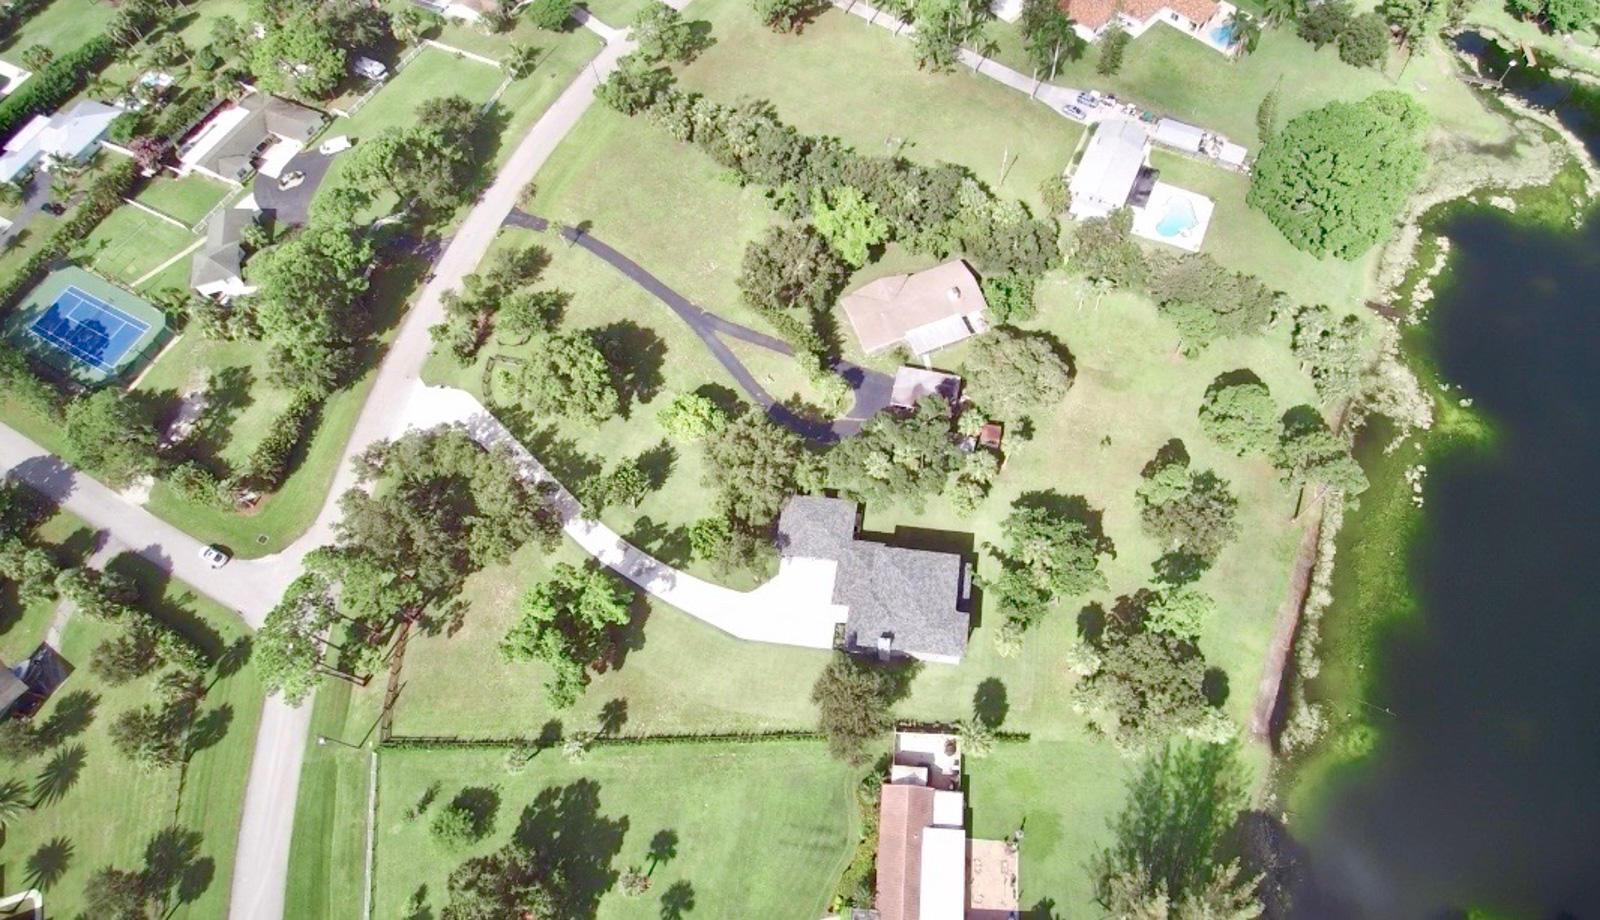 SQUARE LAKE PALM BEACH GARDENS FLORIDA